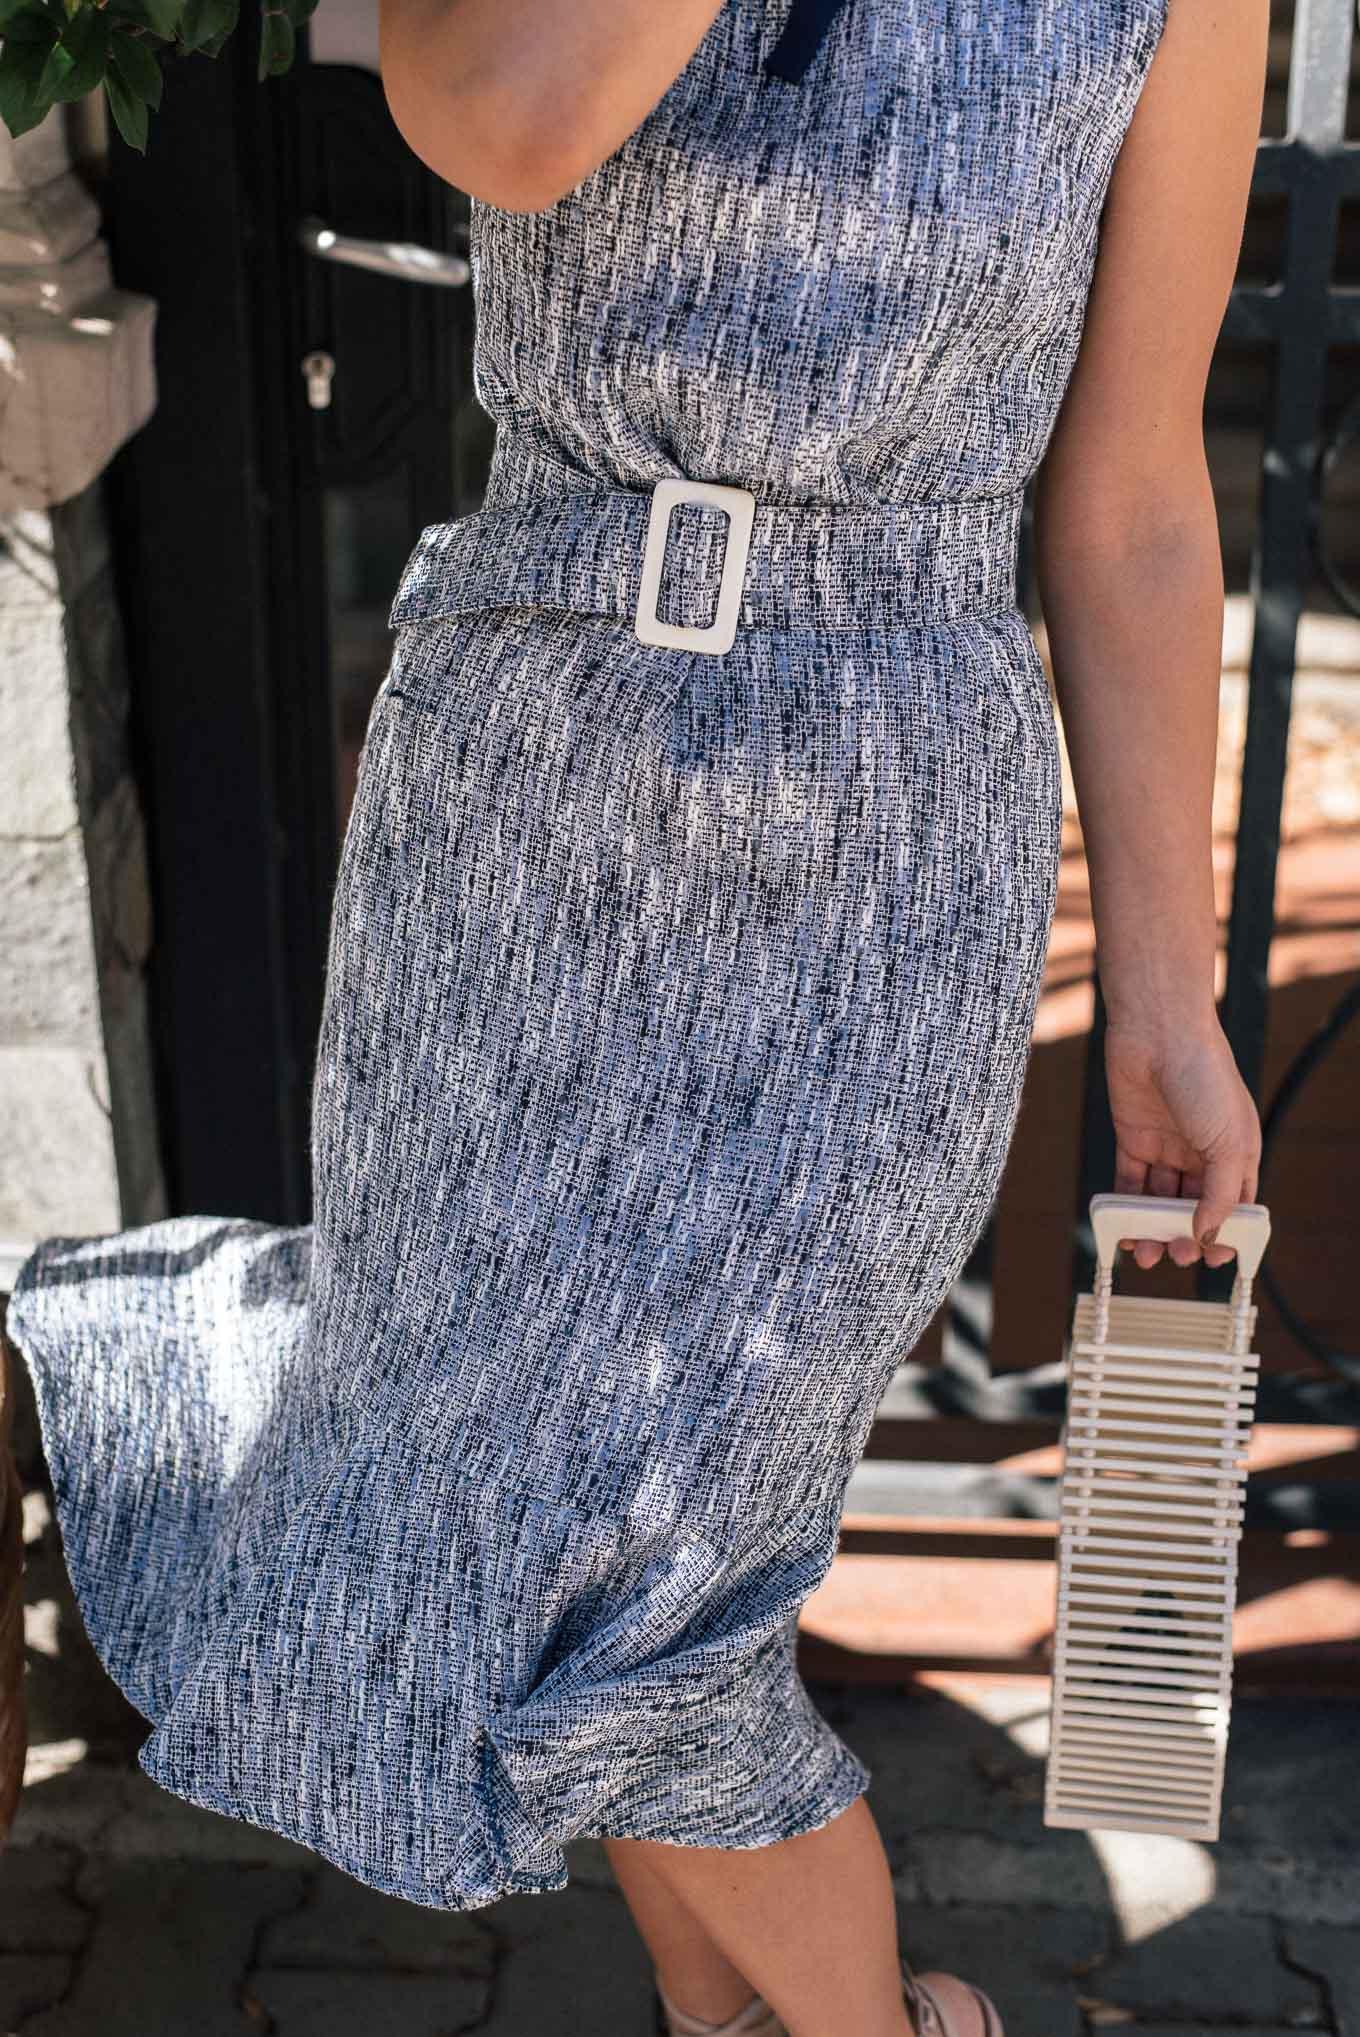 joanna tweed dress SS20